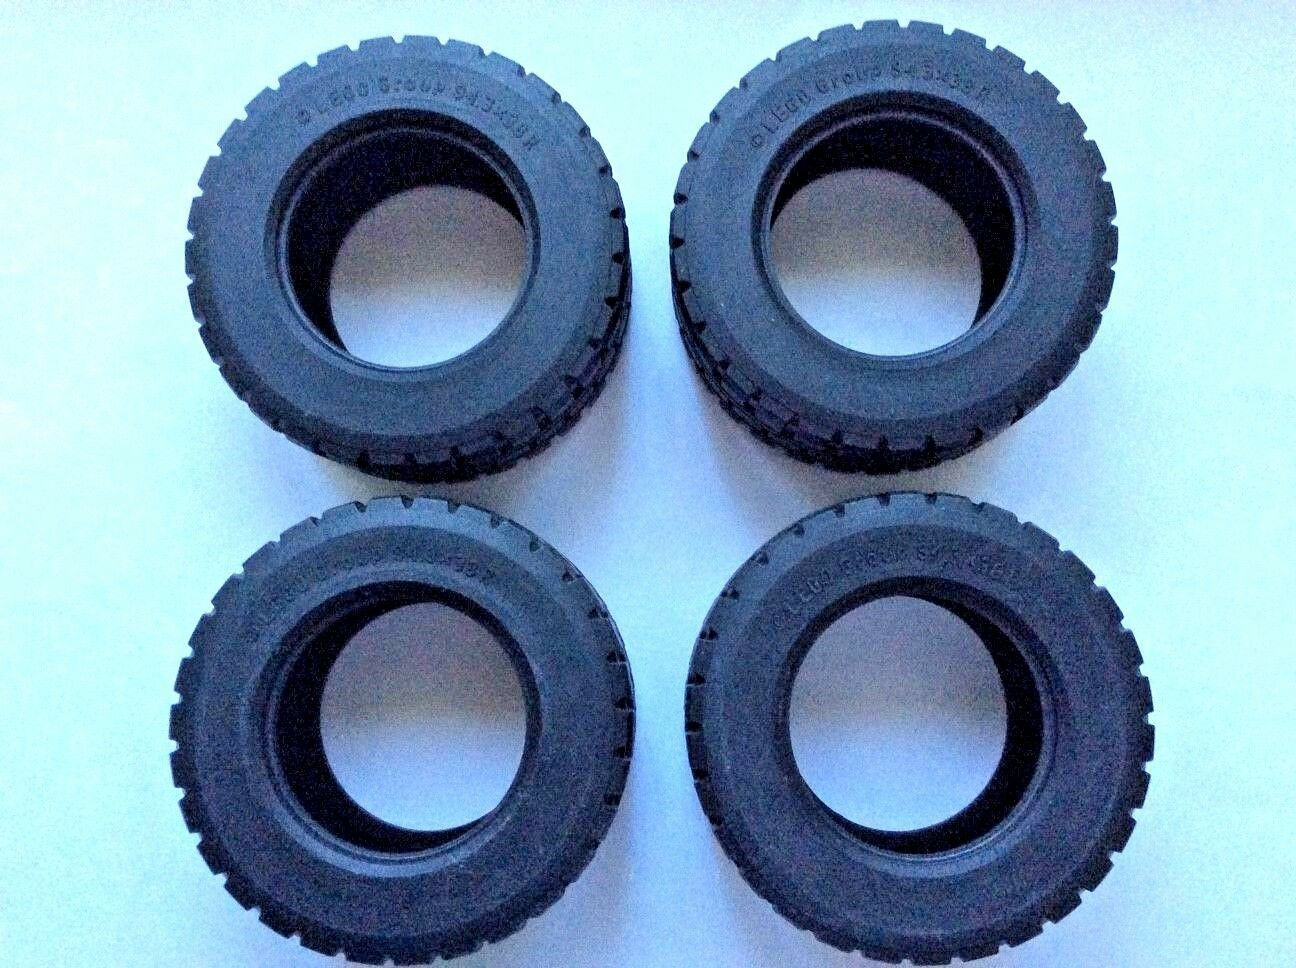 Lego 92912 - Technic Tyre 94.3 x 38 R - Brand New